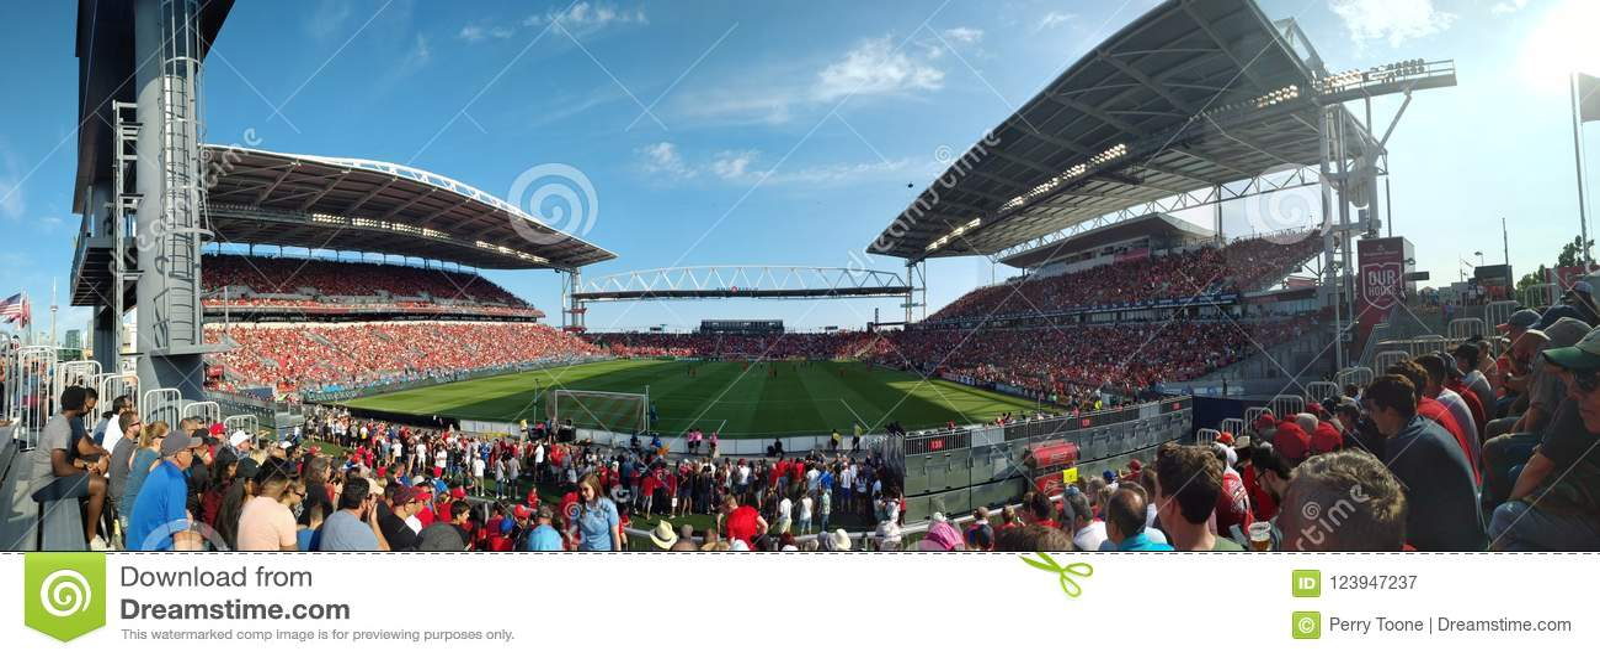 Panoramic view at Toronto FC